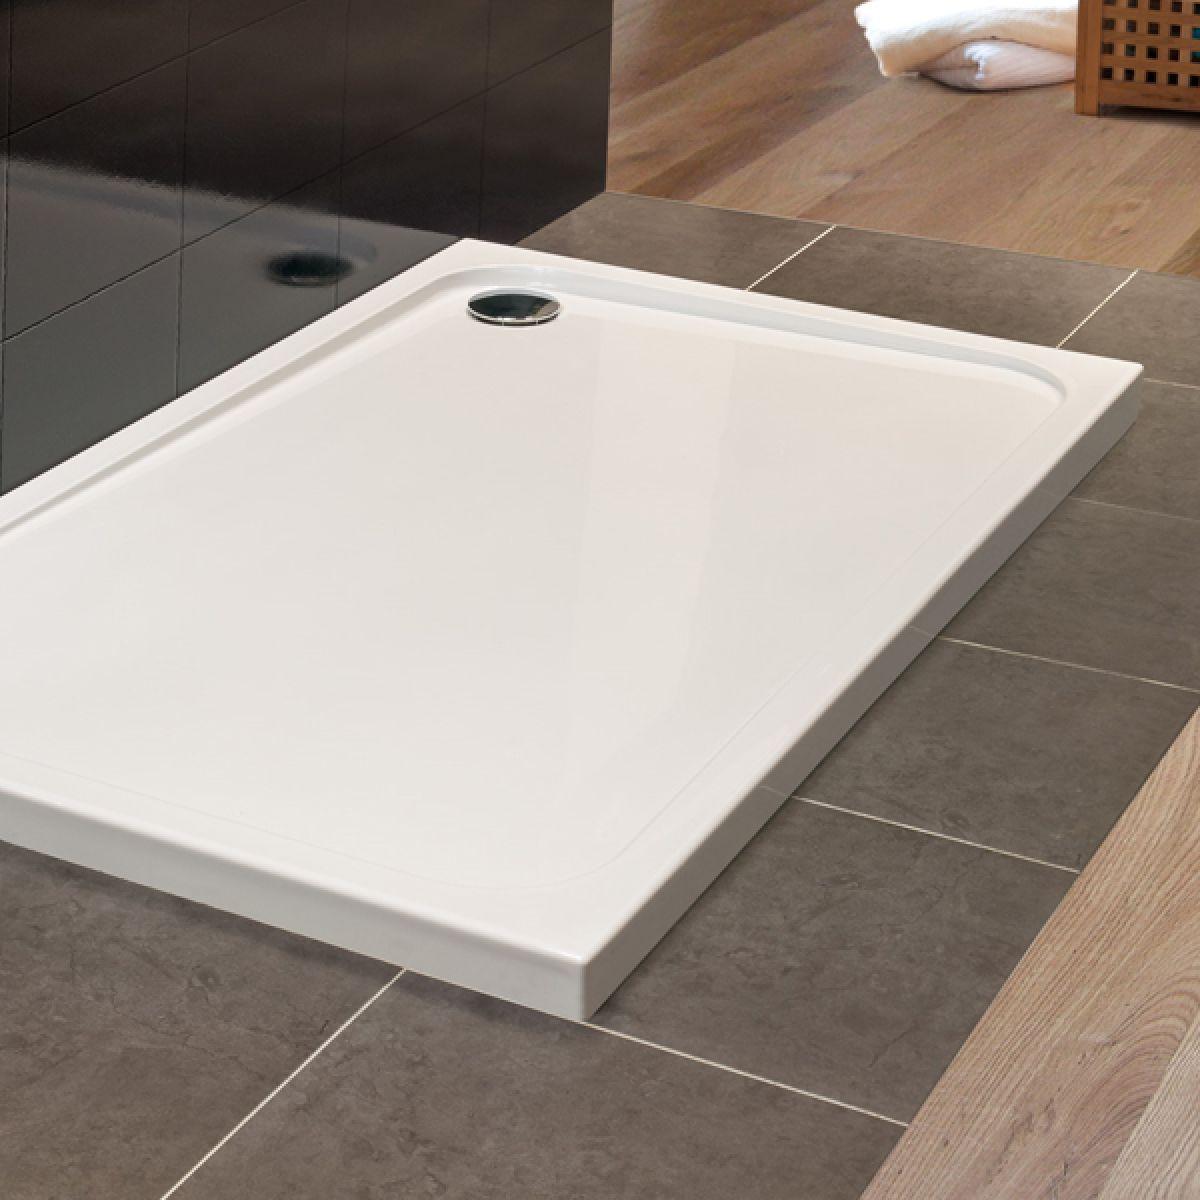 merlyn-mstone-rectangular-shower-tray-1100-x-800mm